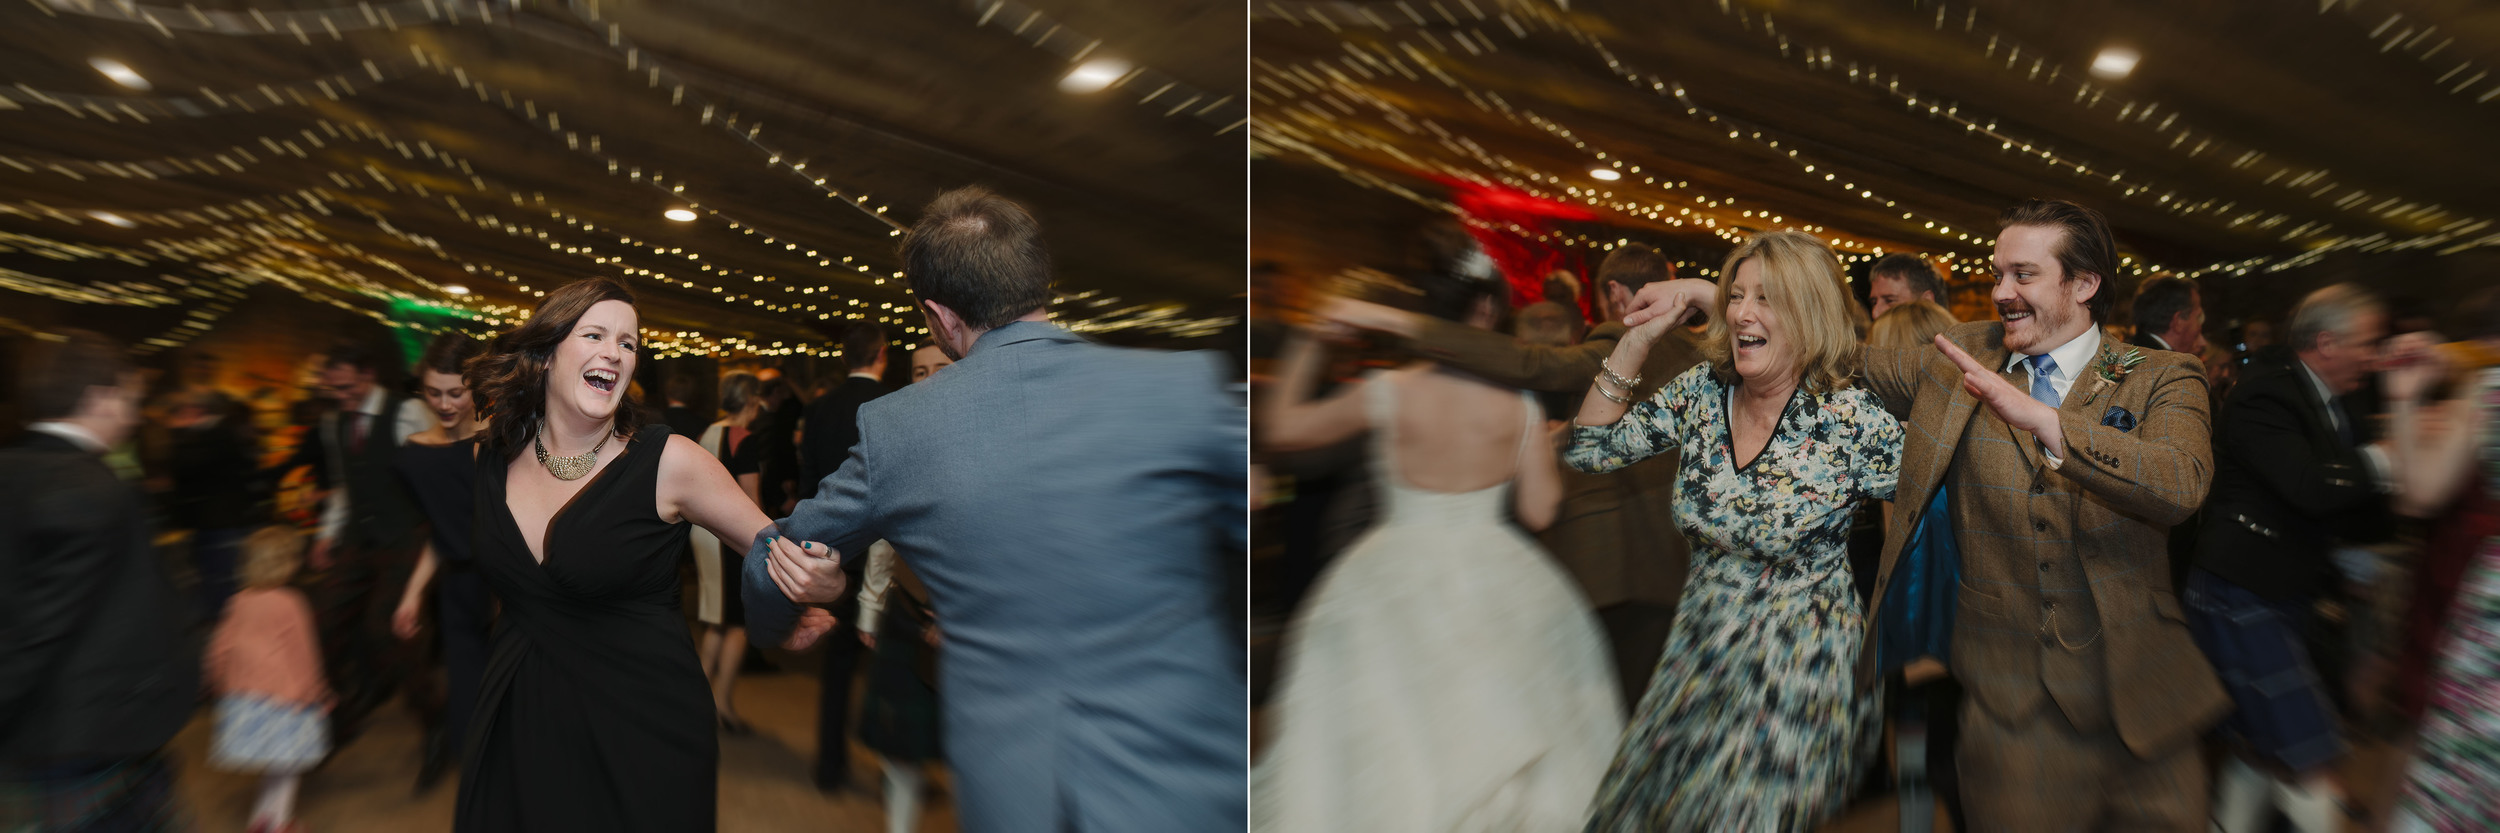 Comrie Croft Wedding Photography 49.jpg